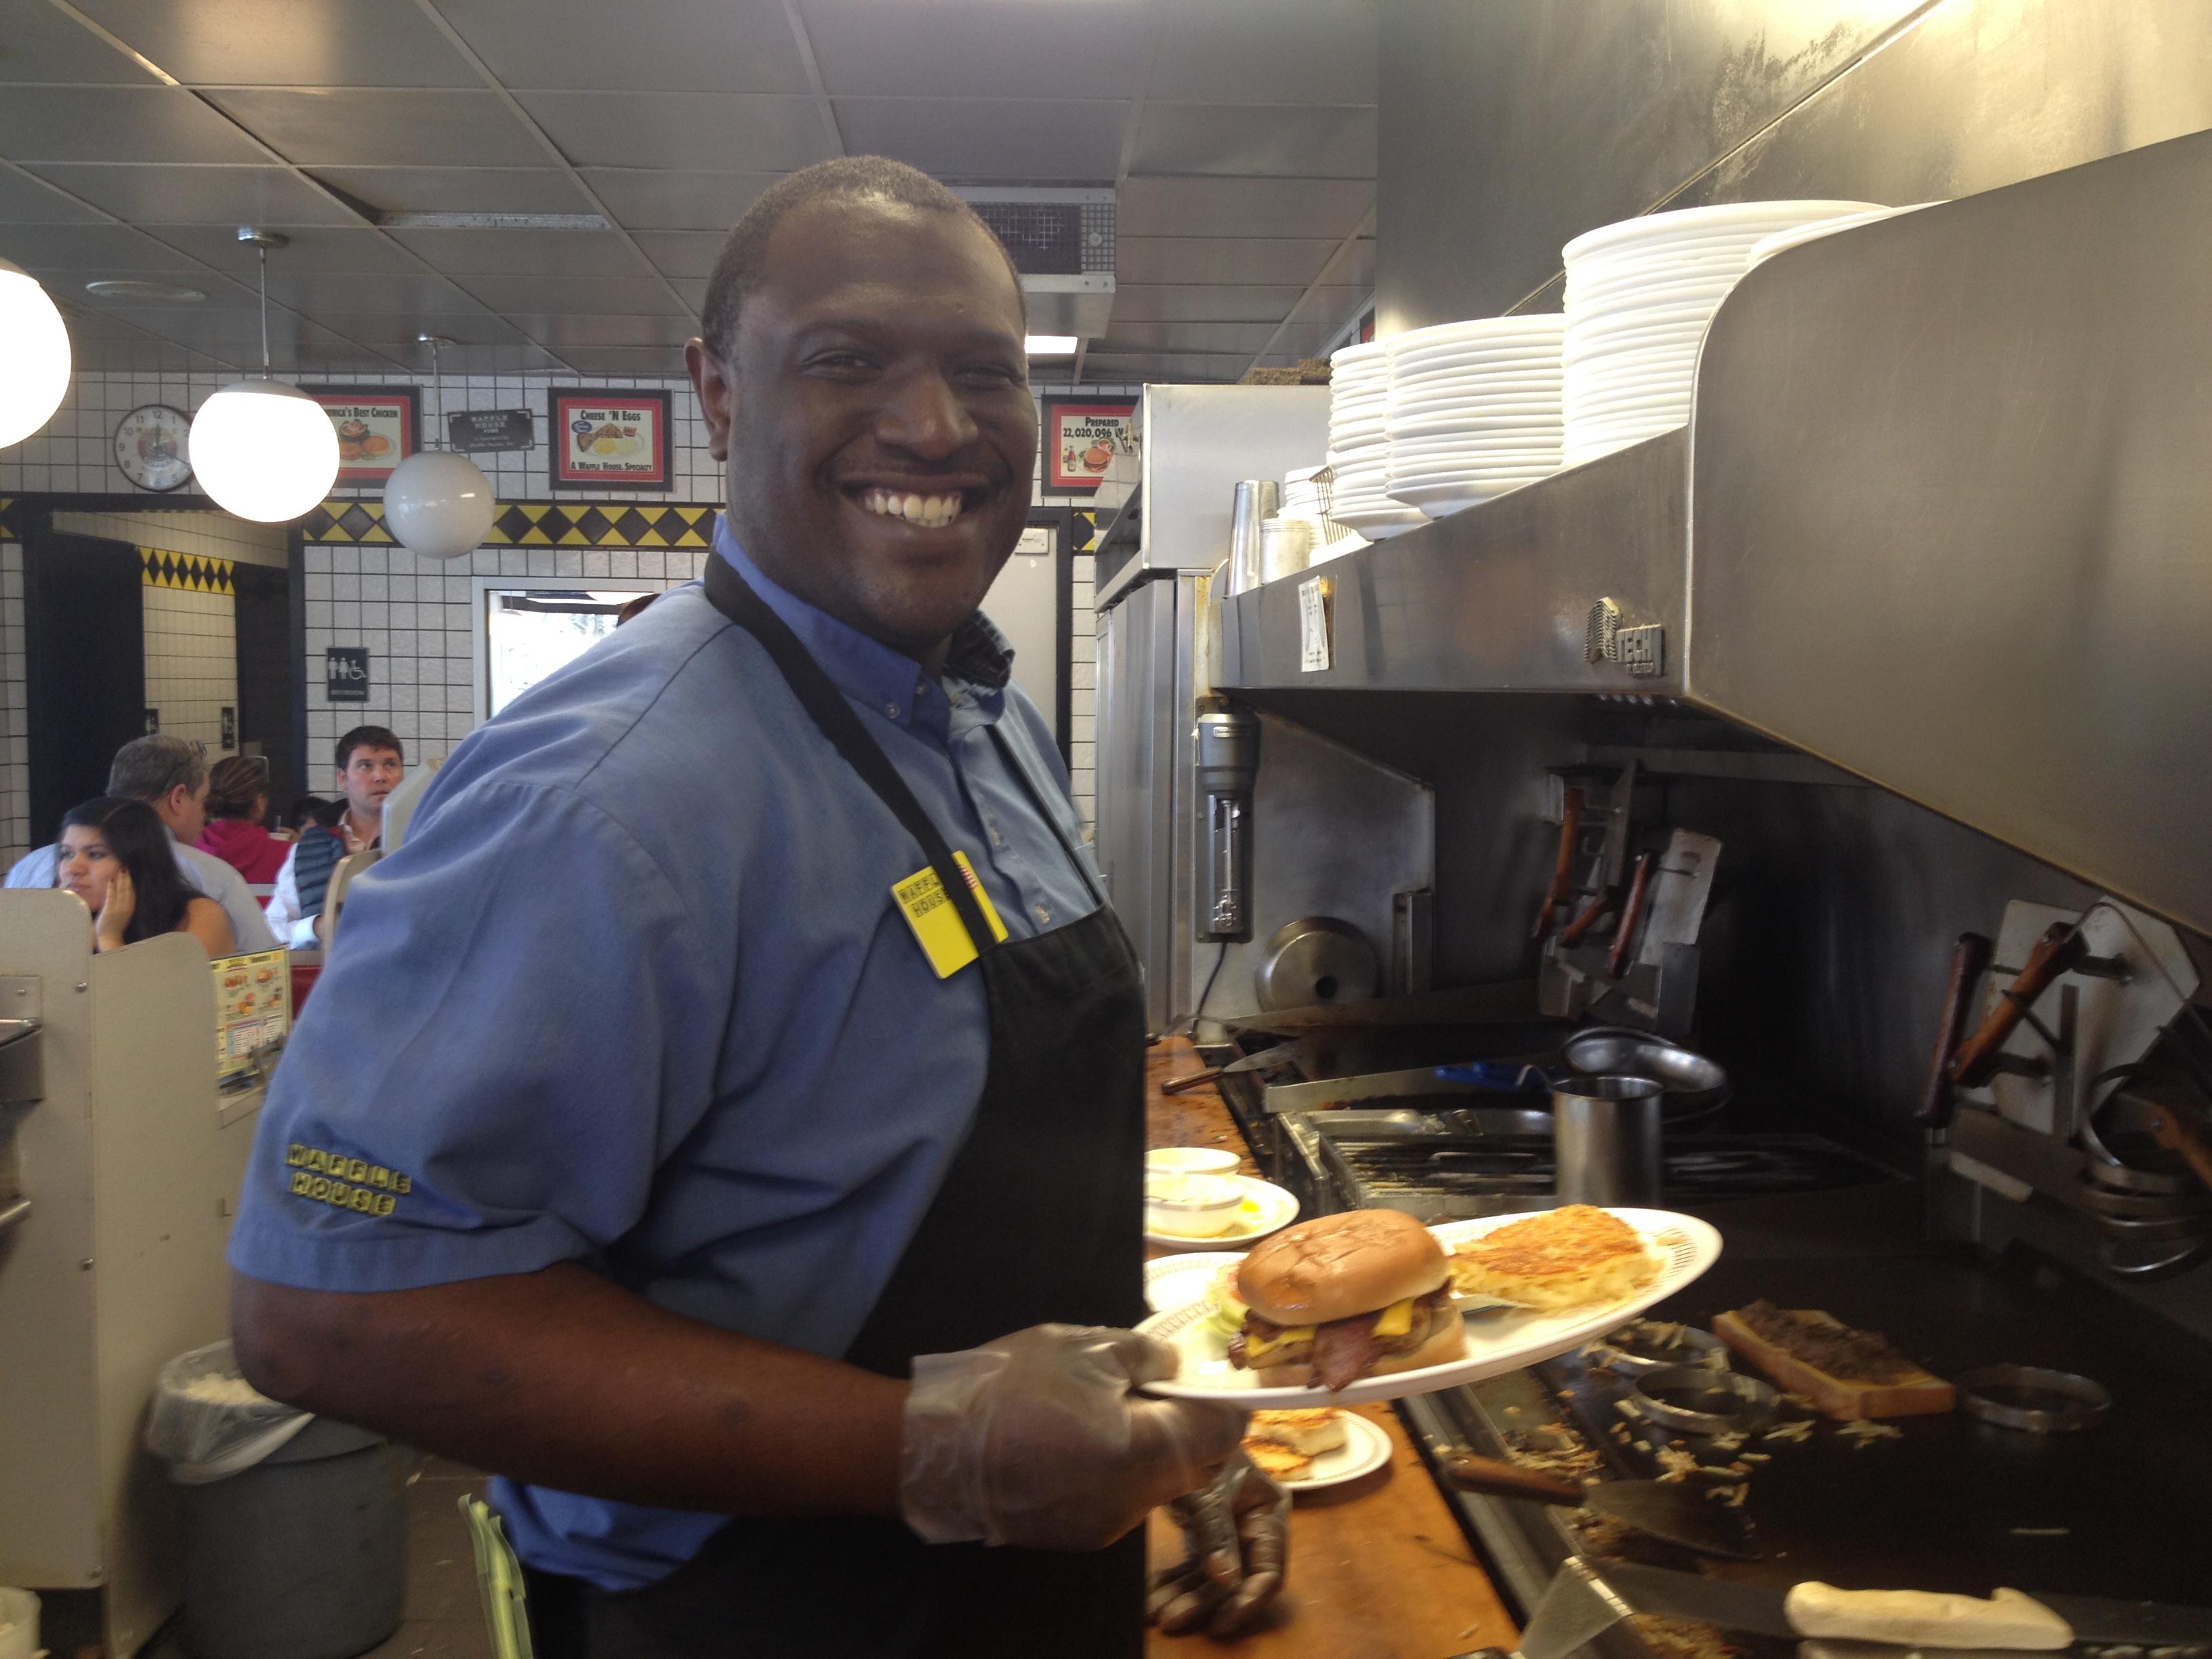 That Alabama State Waffle House Thread